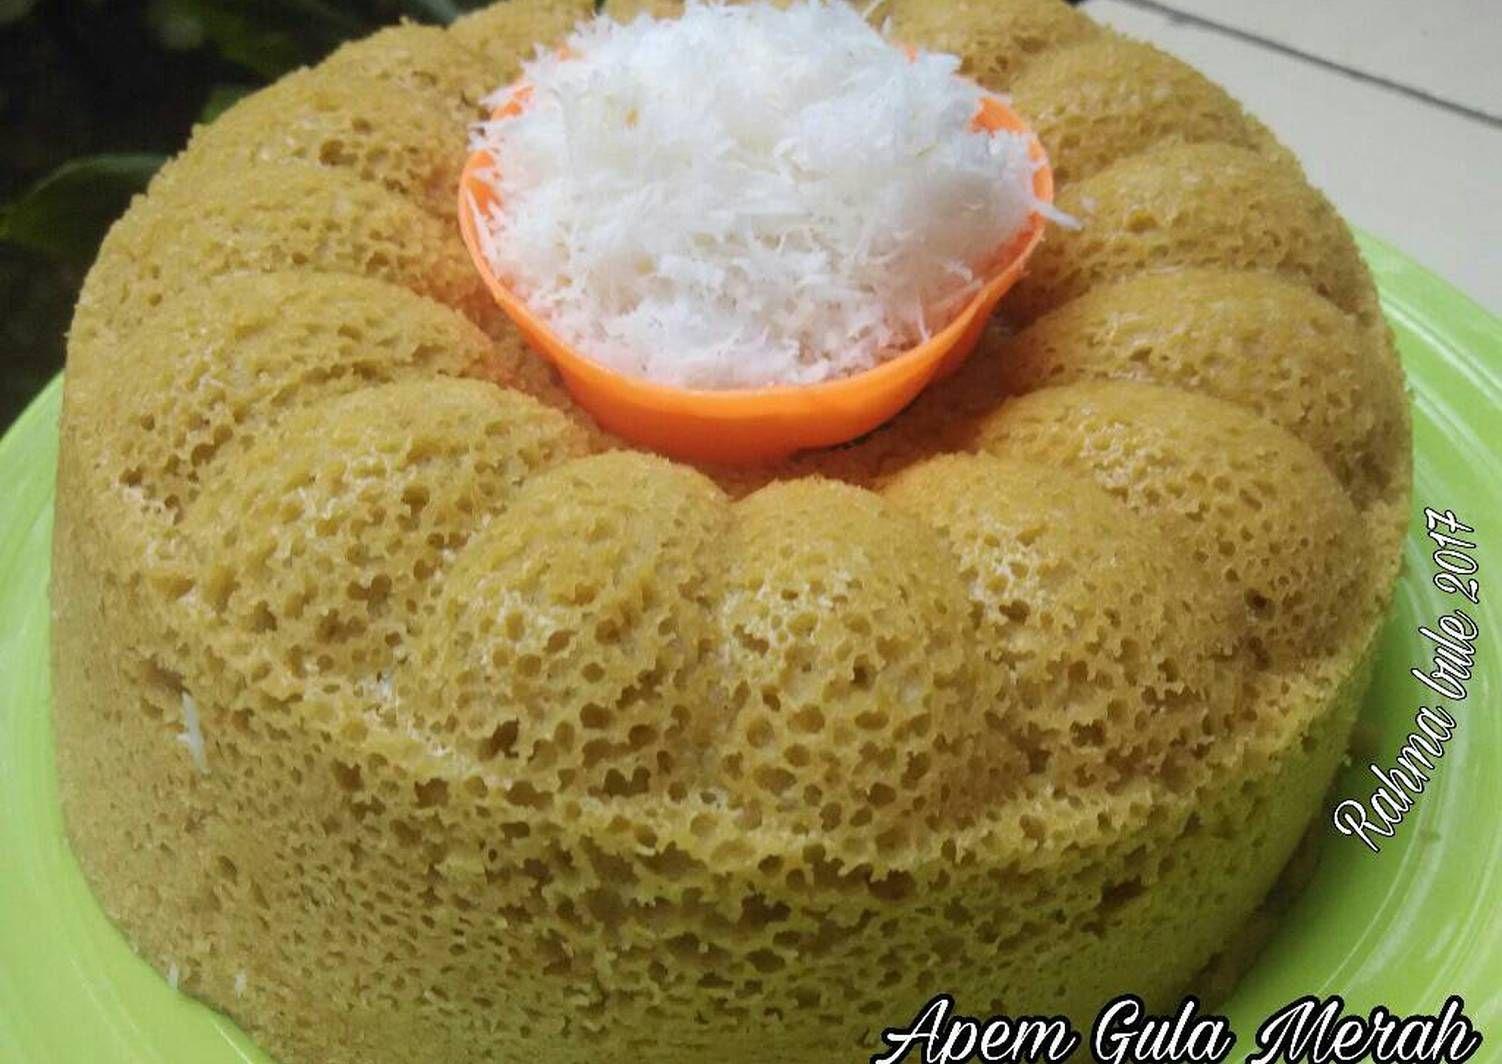 Resep Kue Apem Gula Merah Oleh Rahma Bule Resep Kue Kismis Resep Kue Resep